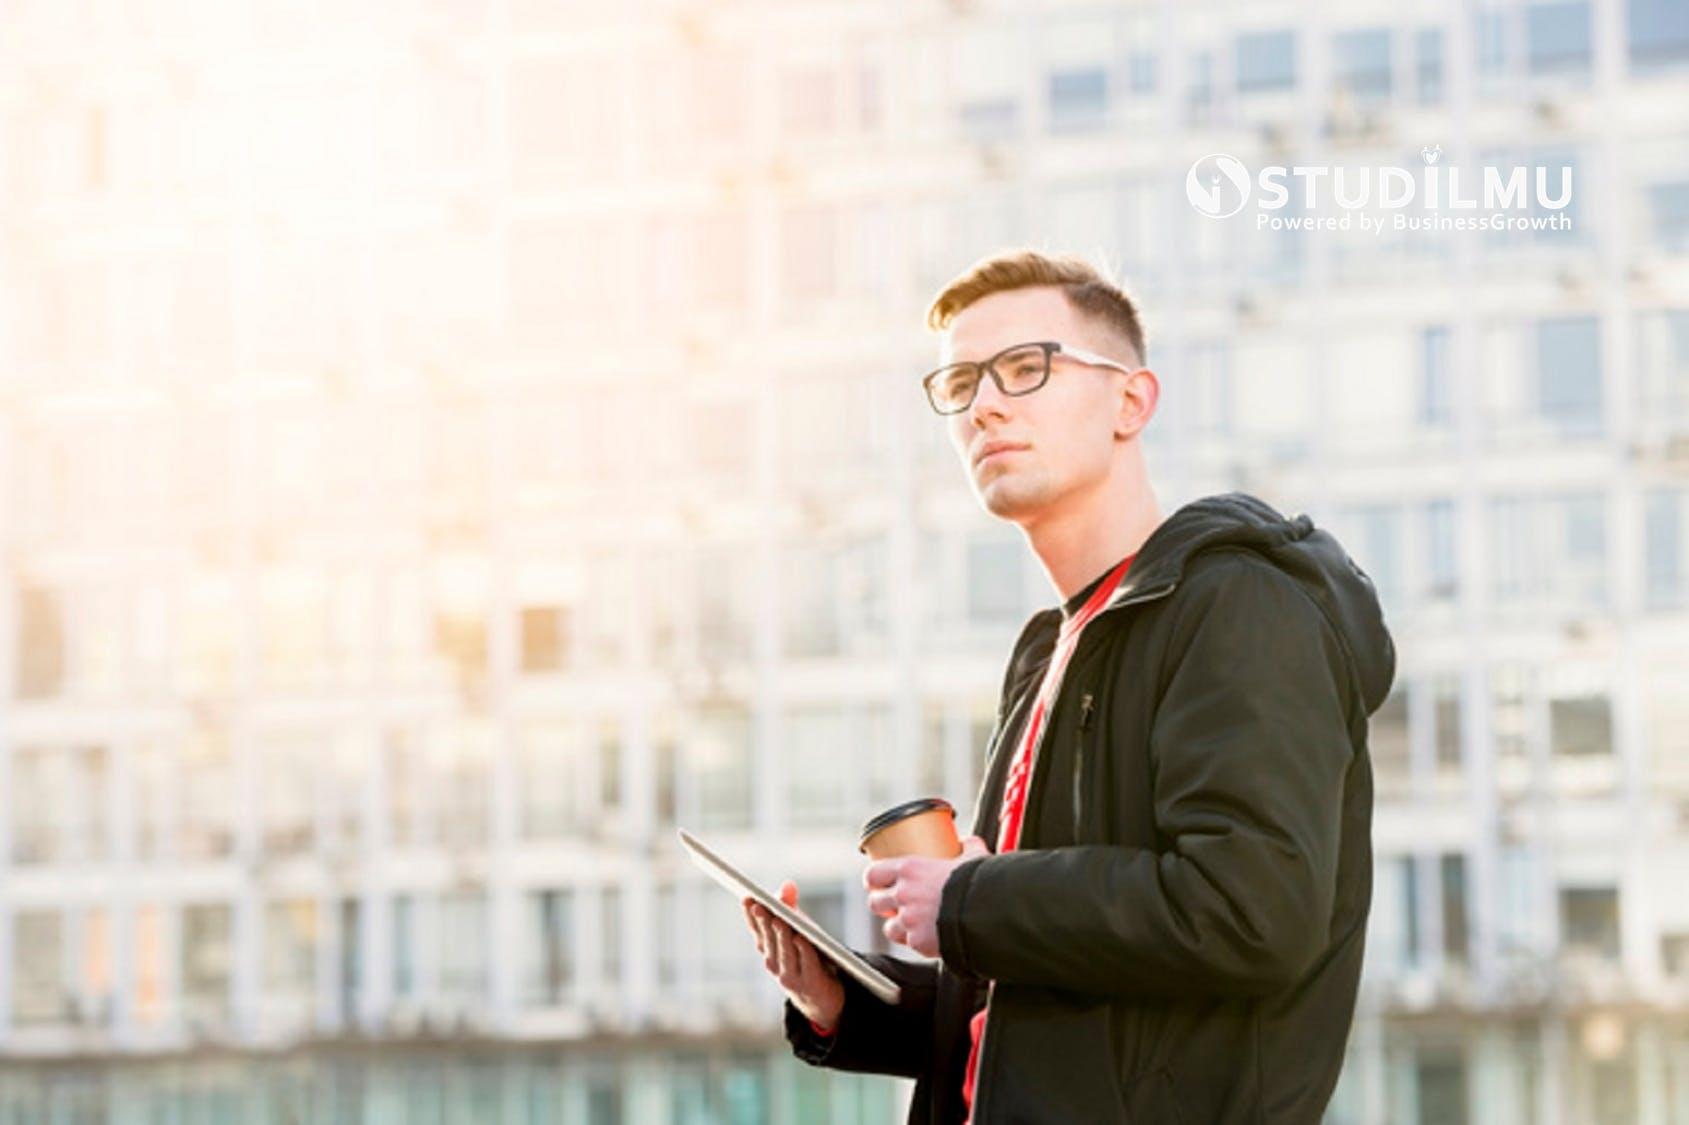 STUDILMU Career Advice - 20 Kebiasaan Baik yang Harus Dimiliki di dalam Hidup